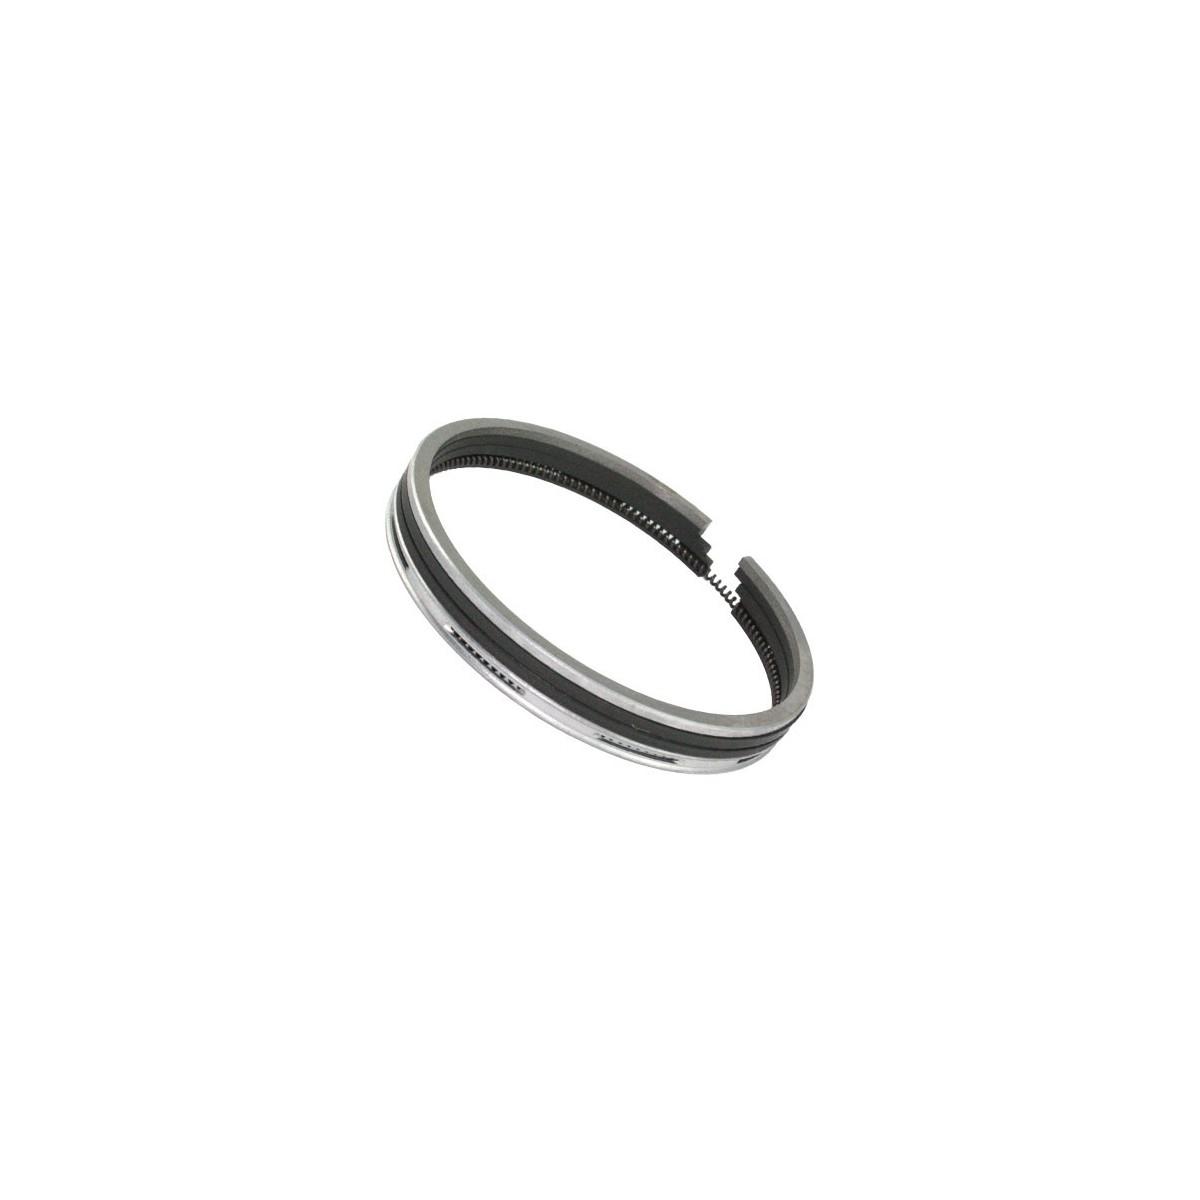 Piston rings set Yanmar YM-2000-YM1900 705500-22500 88: STD